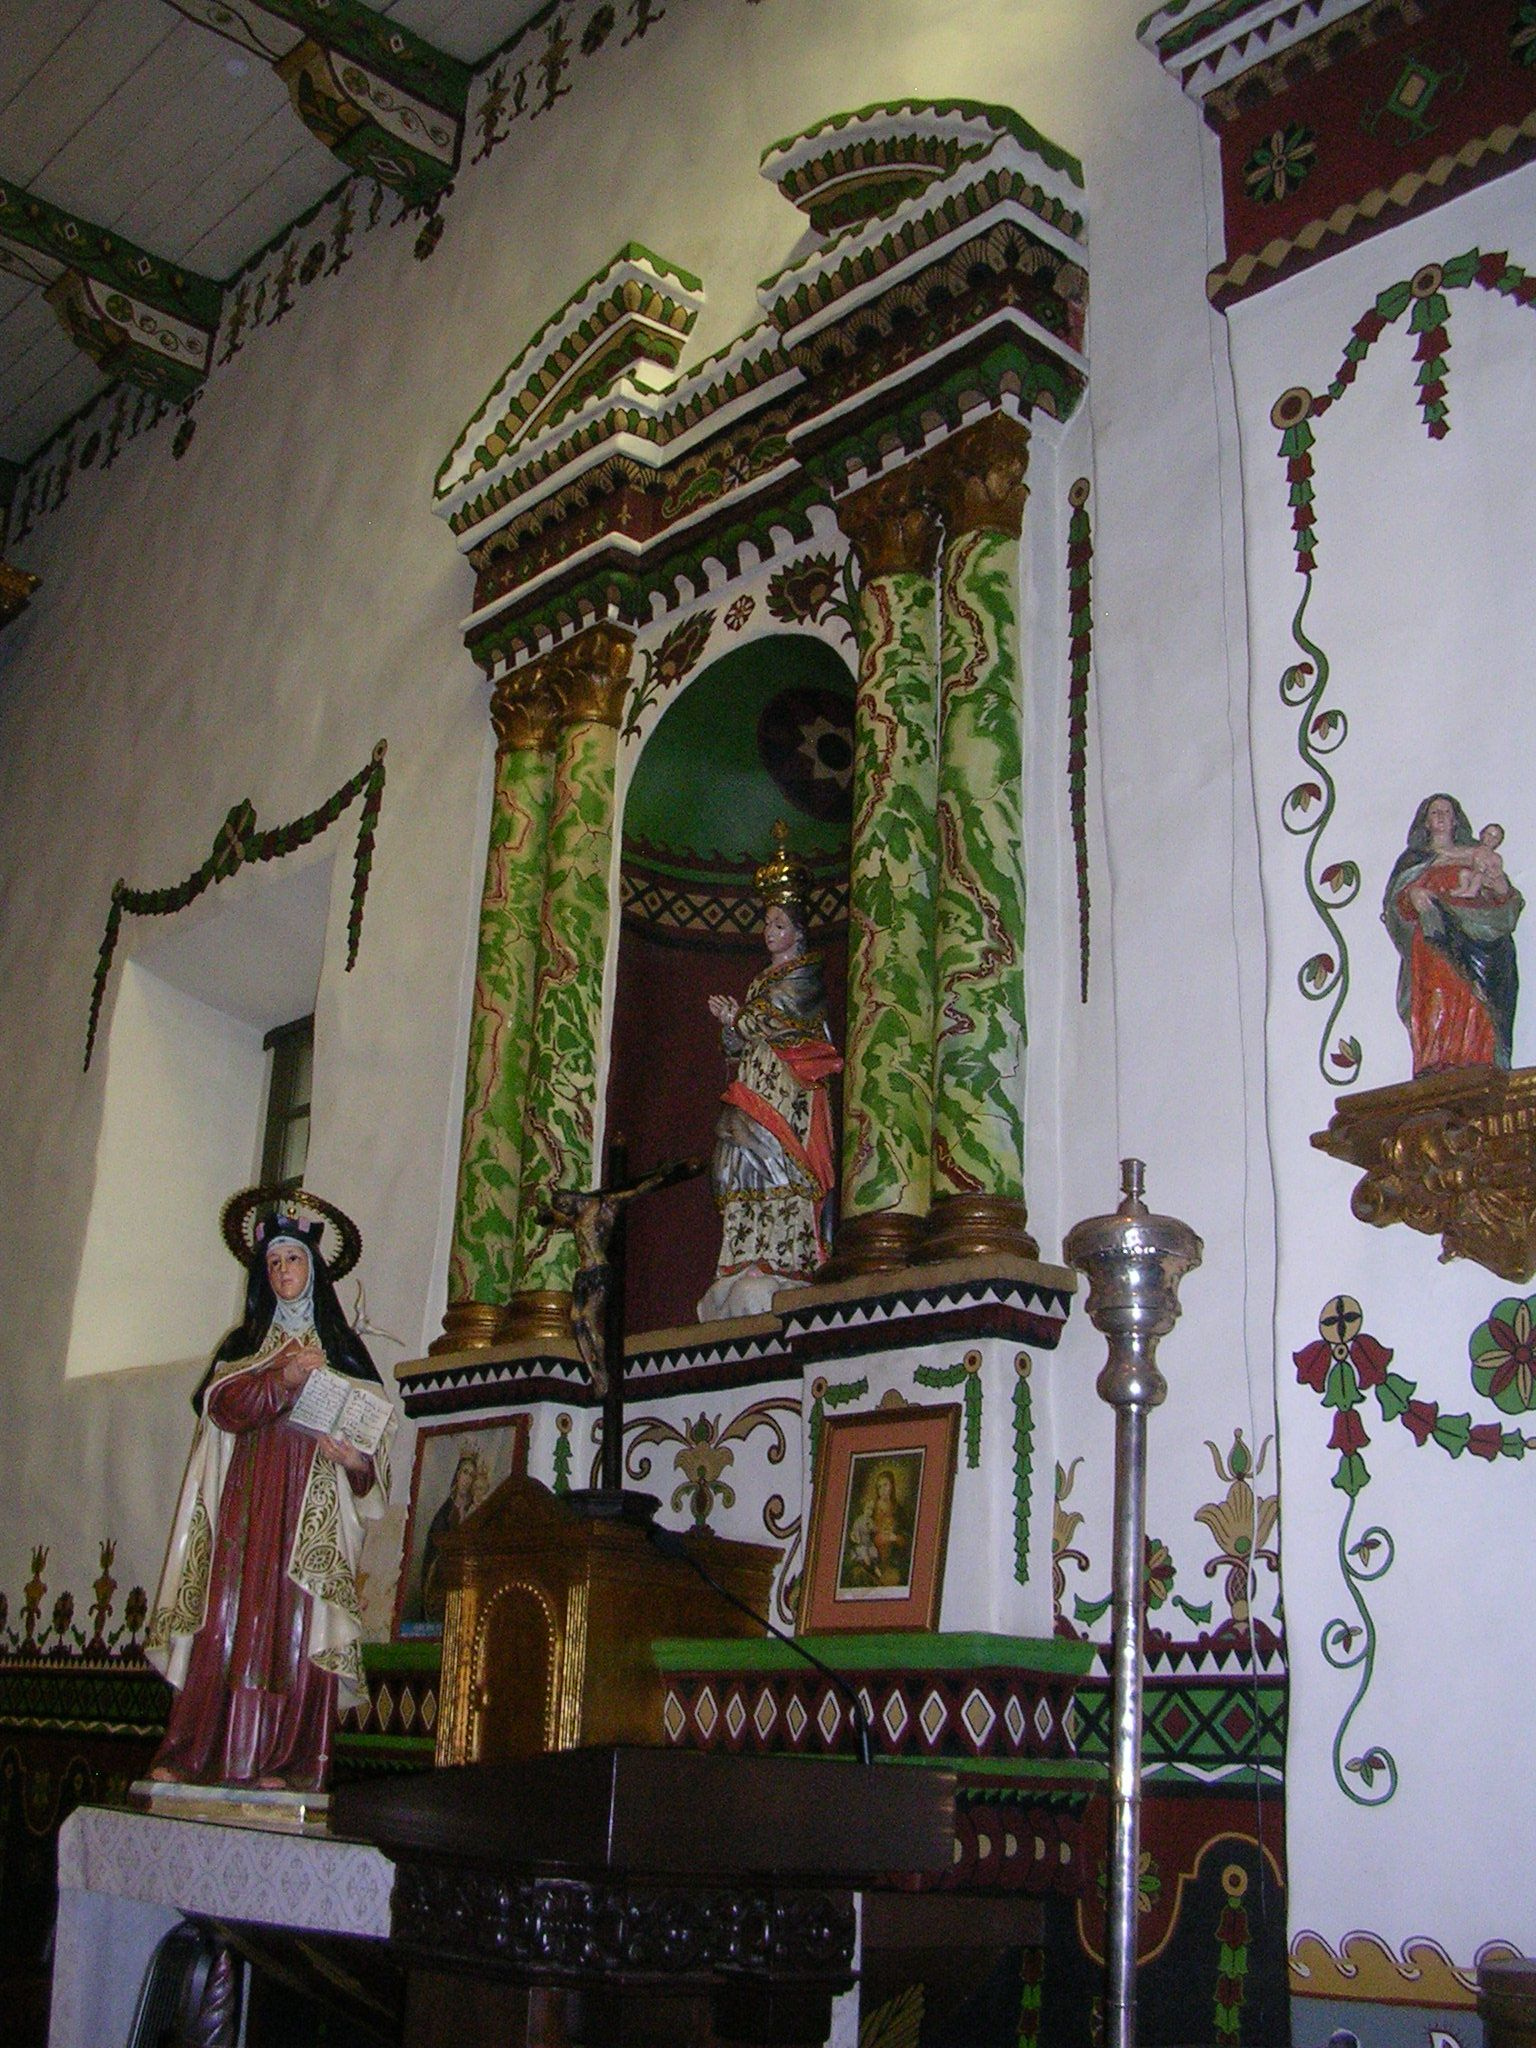 Mission San Juan Capistrano Wall Decorations In Serra Chapel Mission San Juan Capistrano California Missions San Juan Capistrano